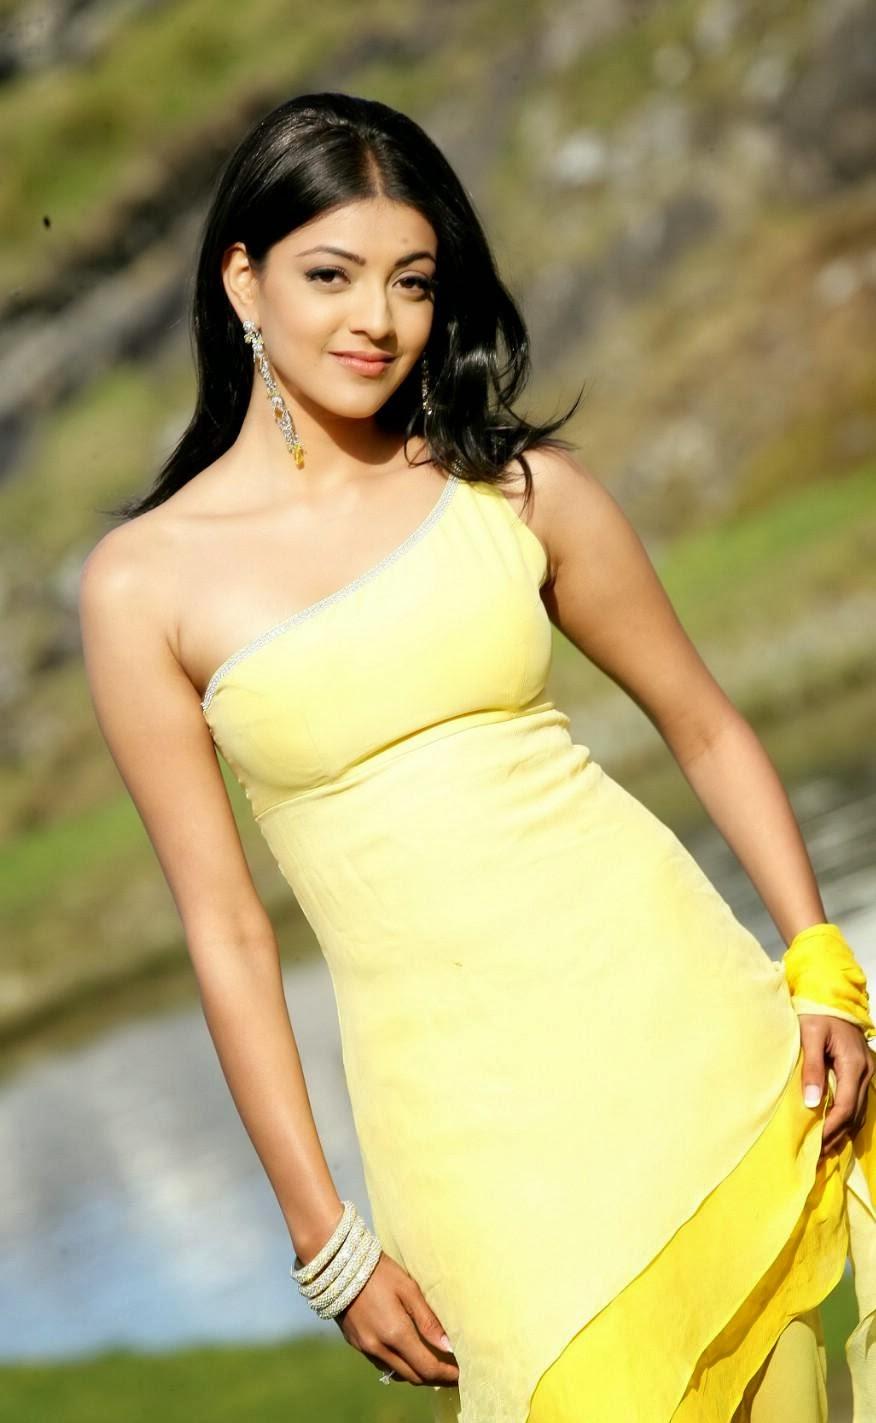 Kajal Agarwal Beautiful Photos in Yellow Dress